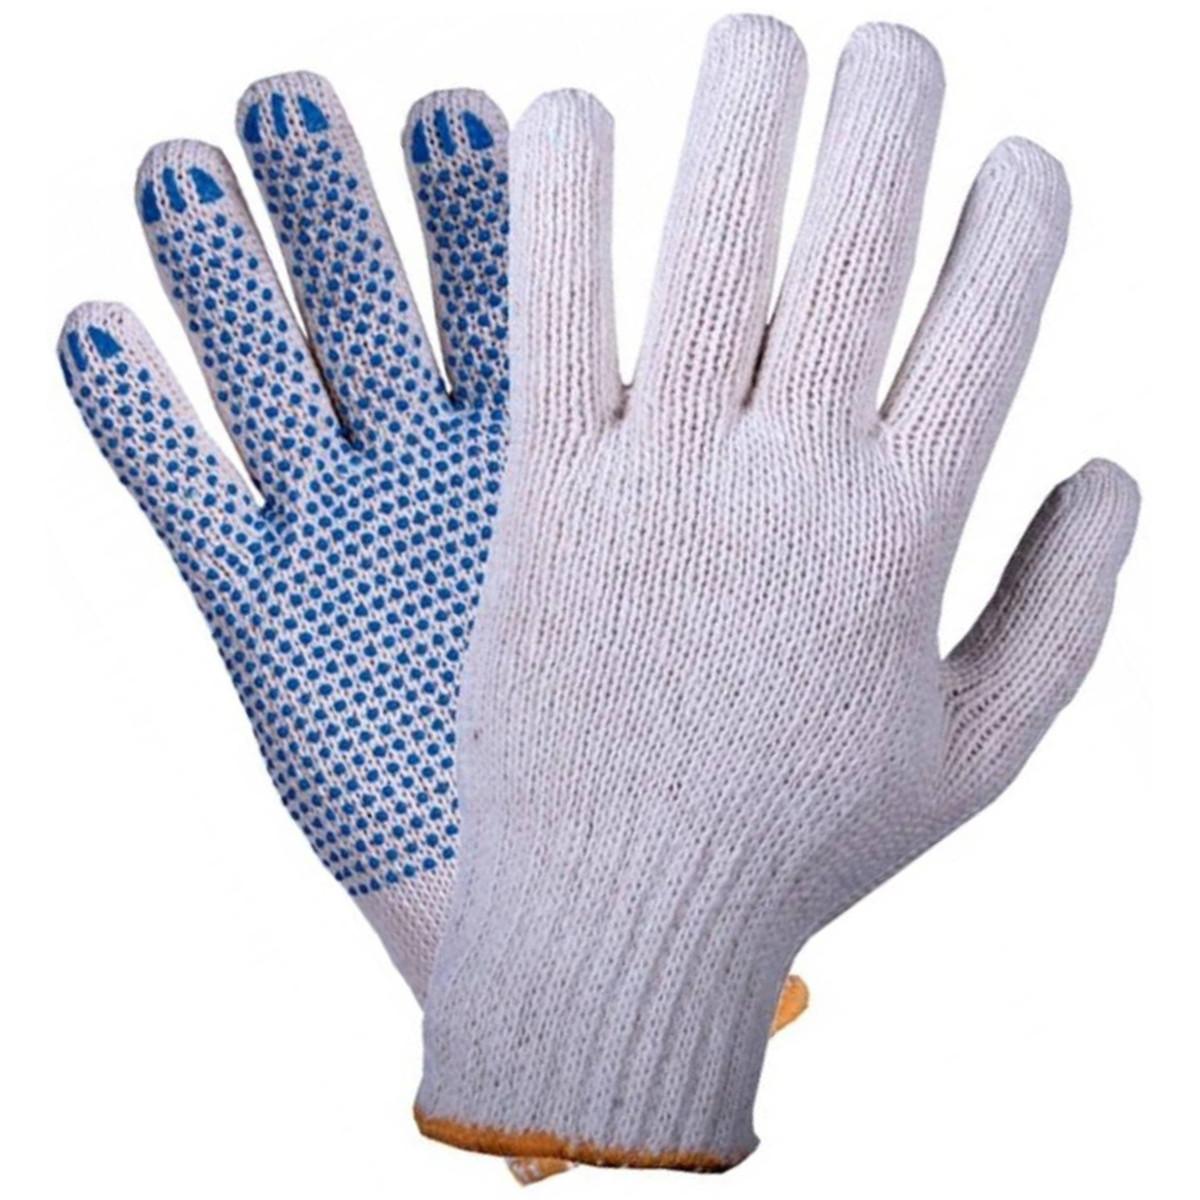 Набор перчаток х/б с ПВХ 6 пар